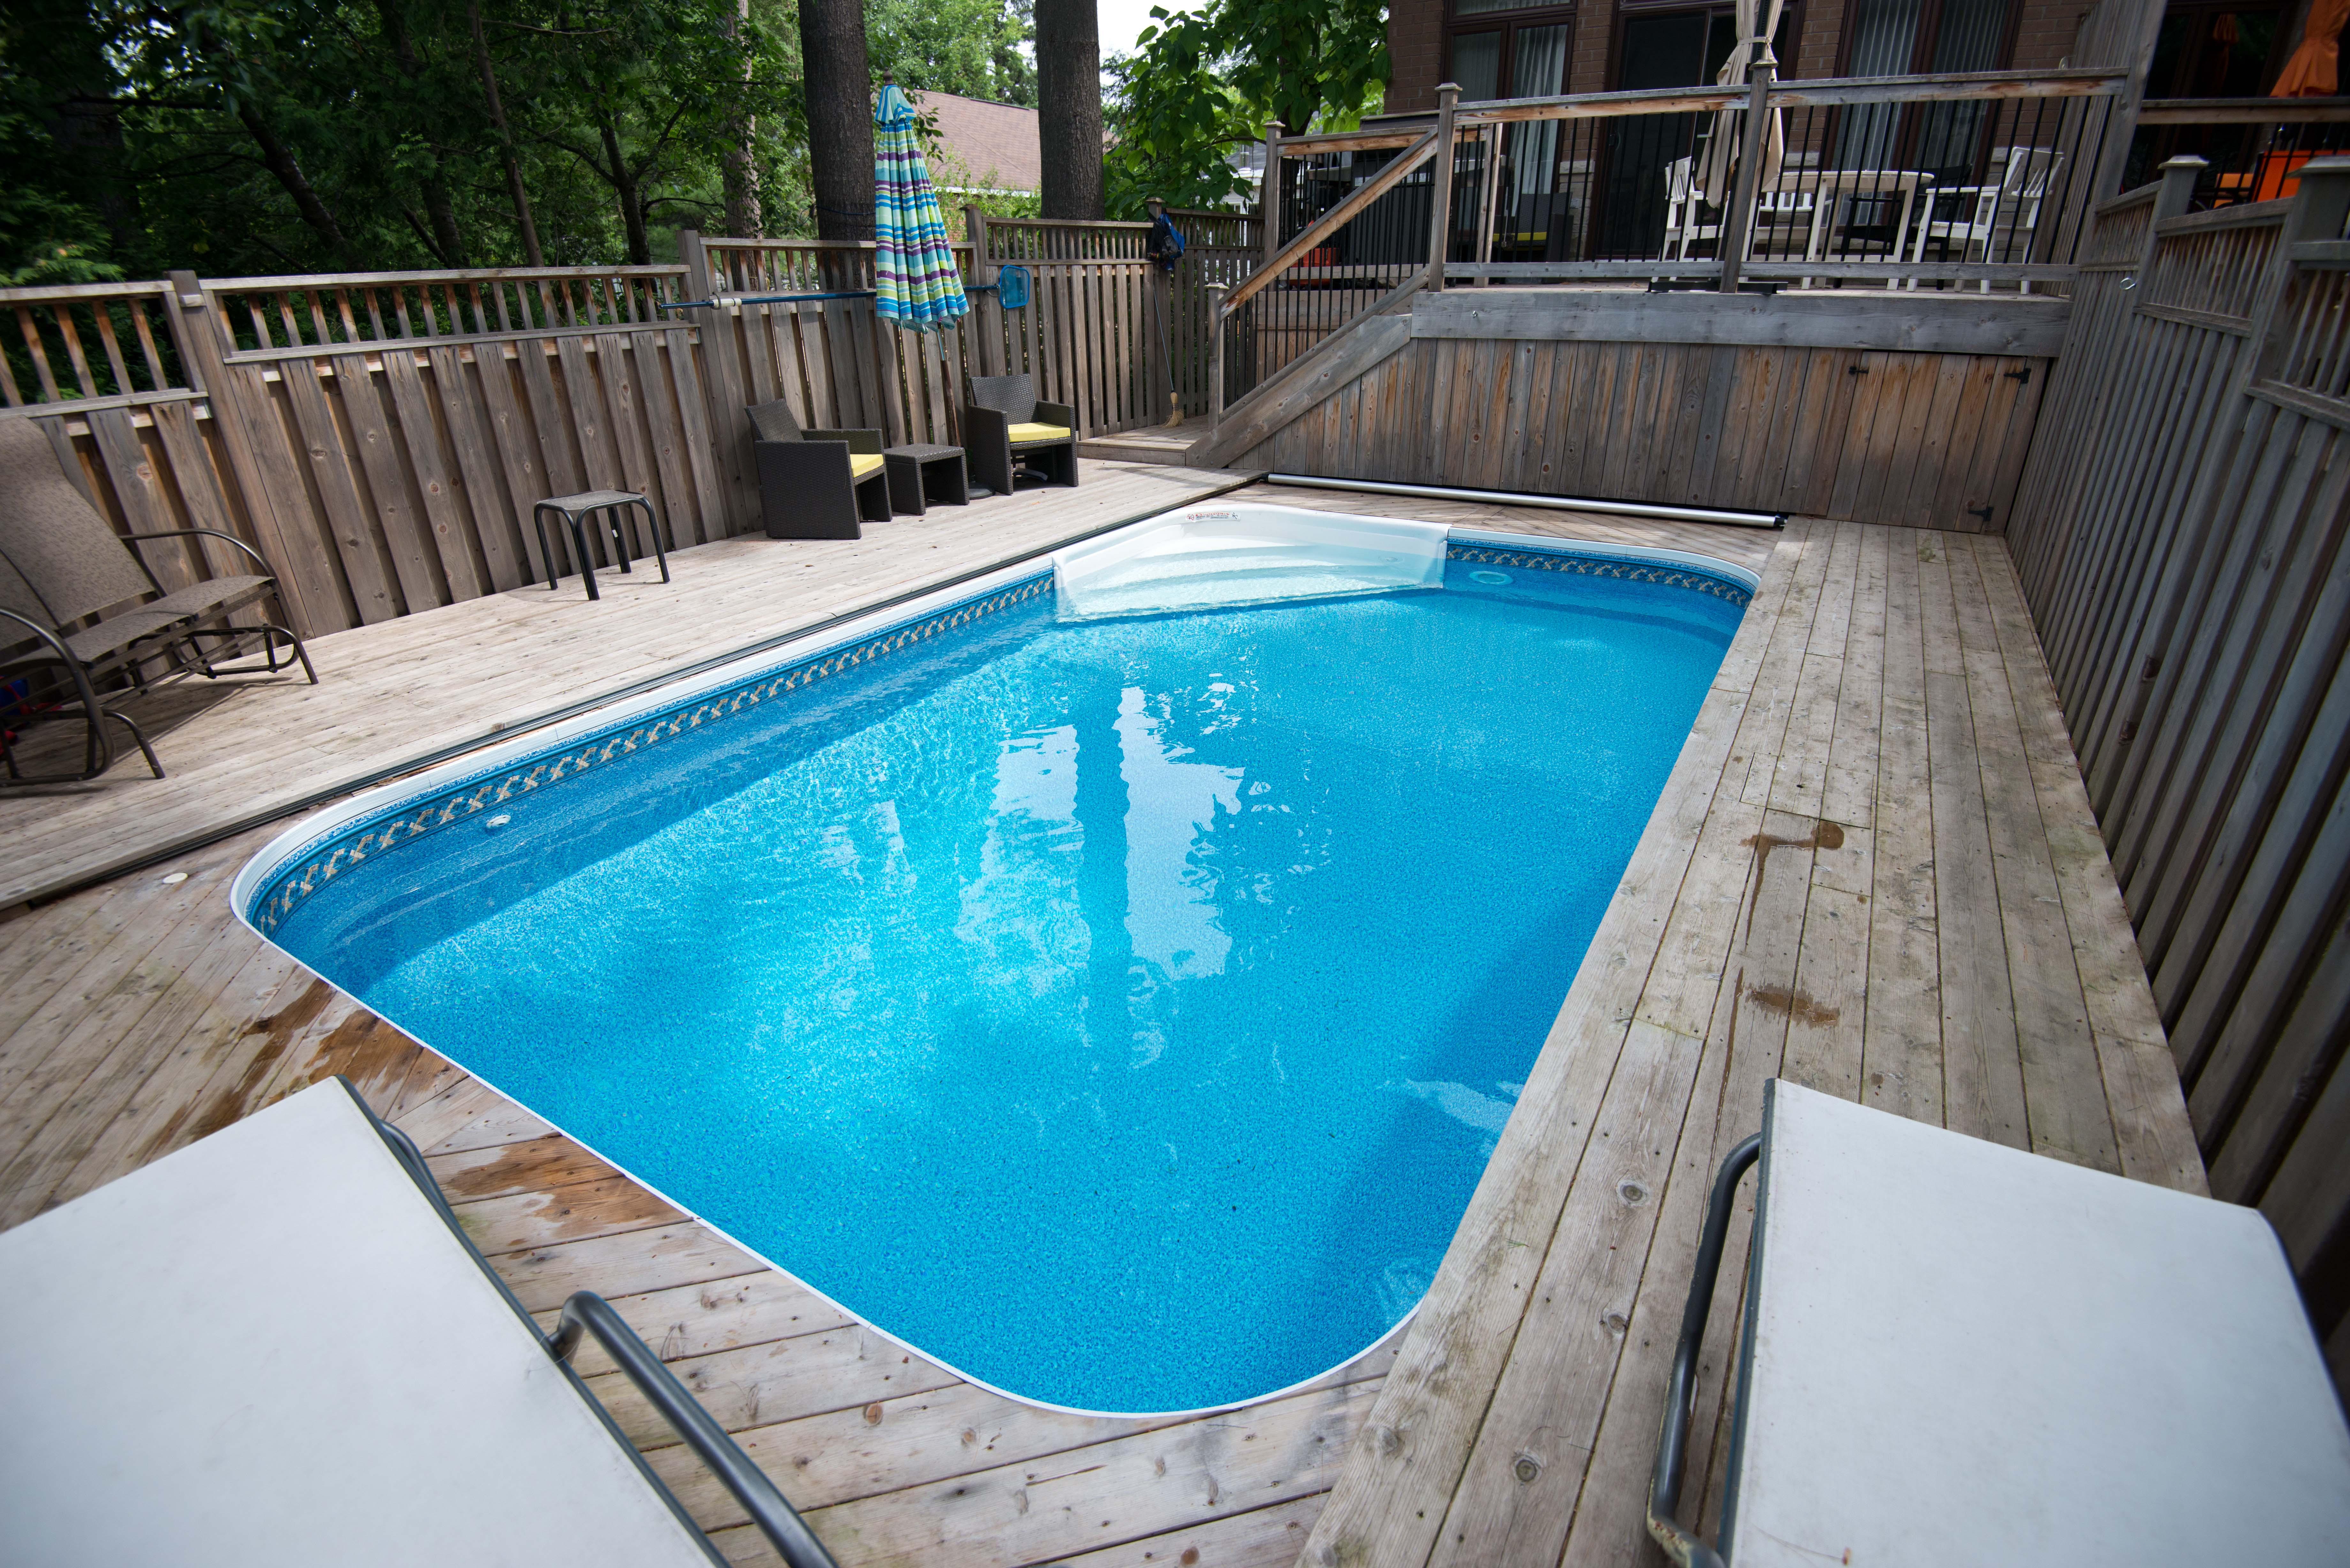 Vinyl Inground Swimming Pools For Ottawa Homes Poolarama